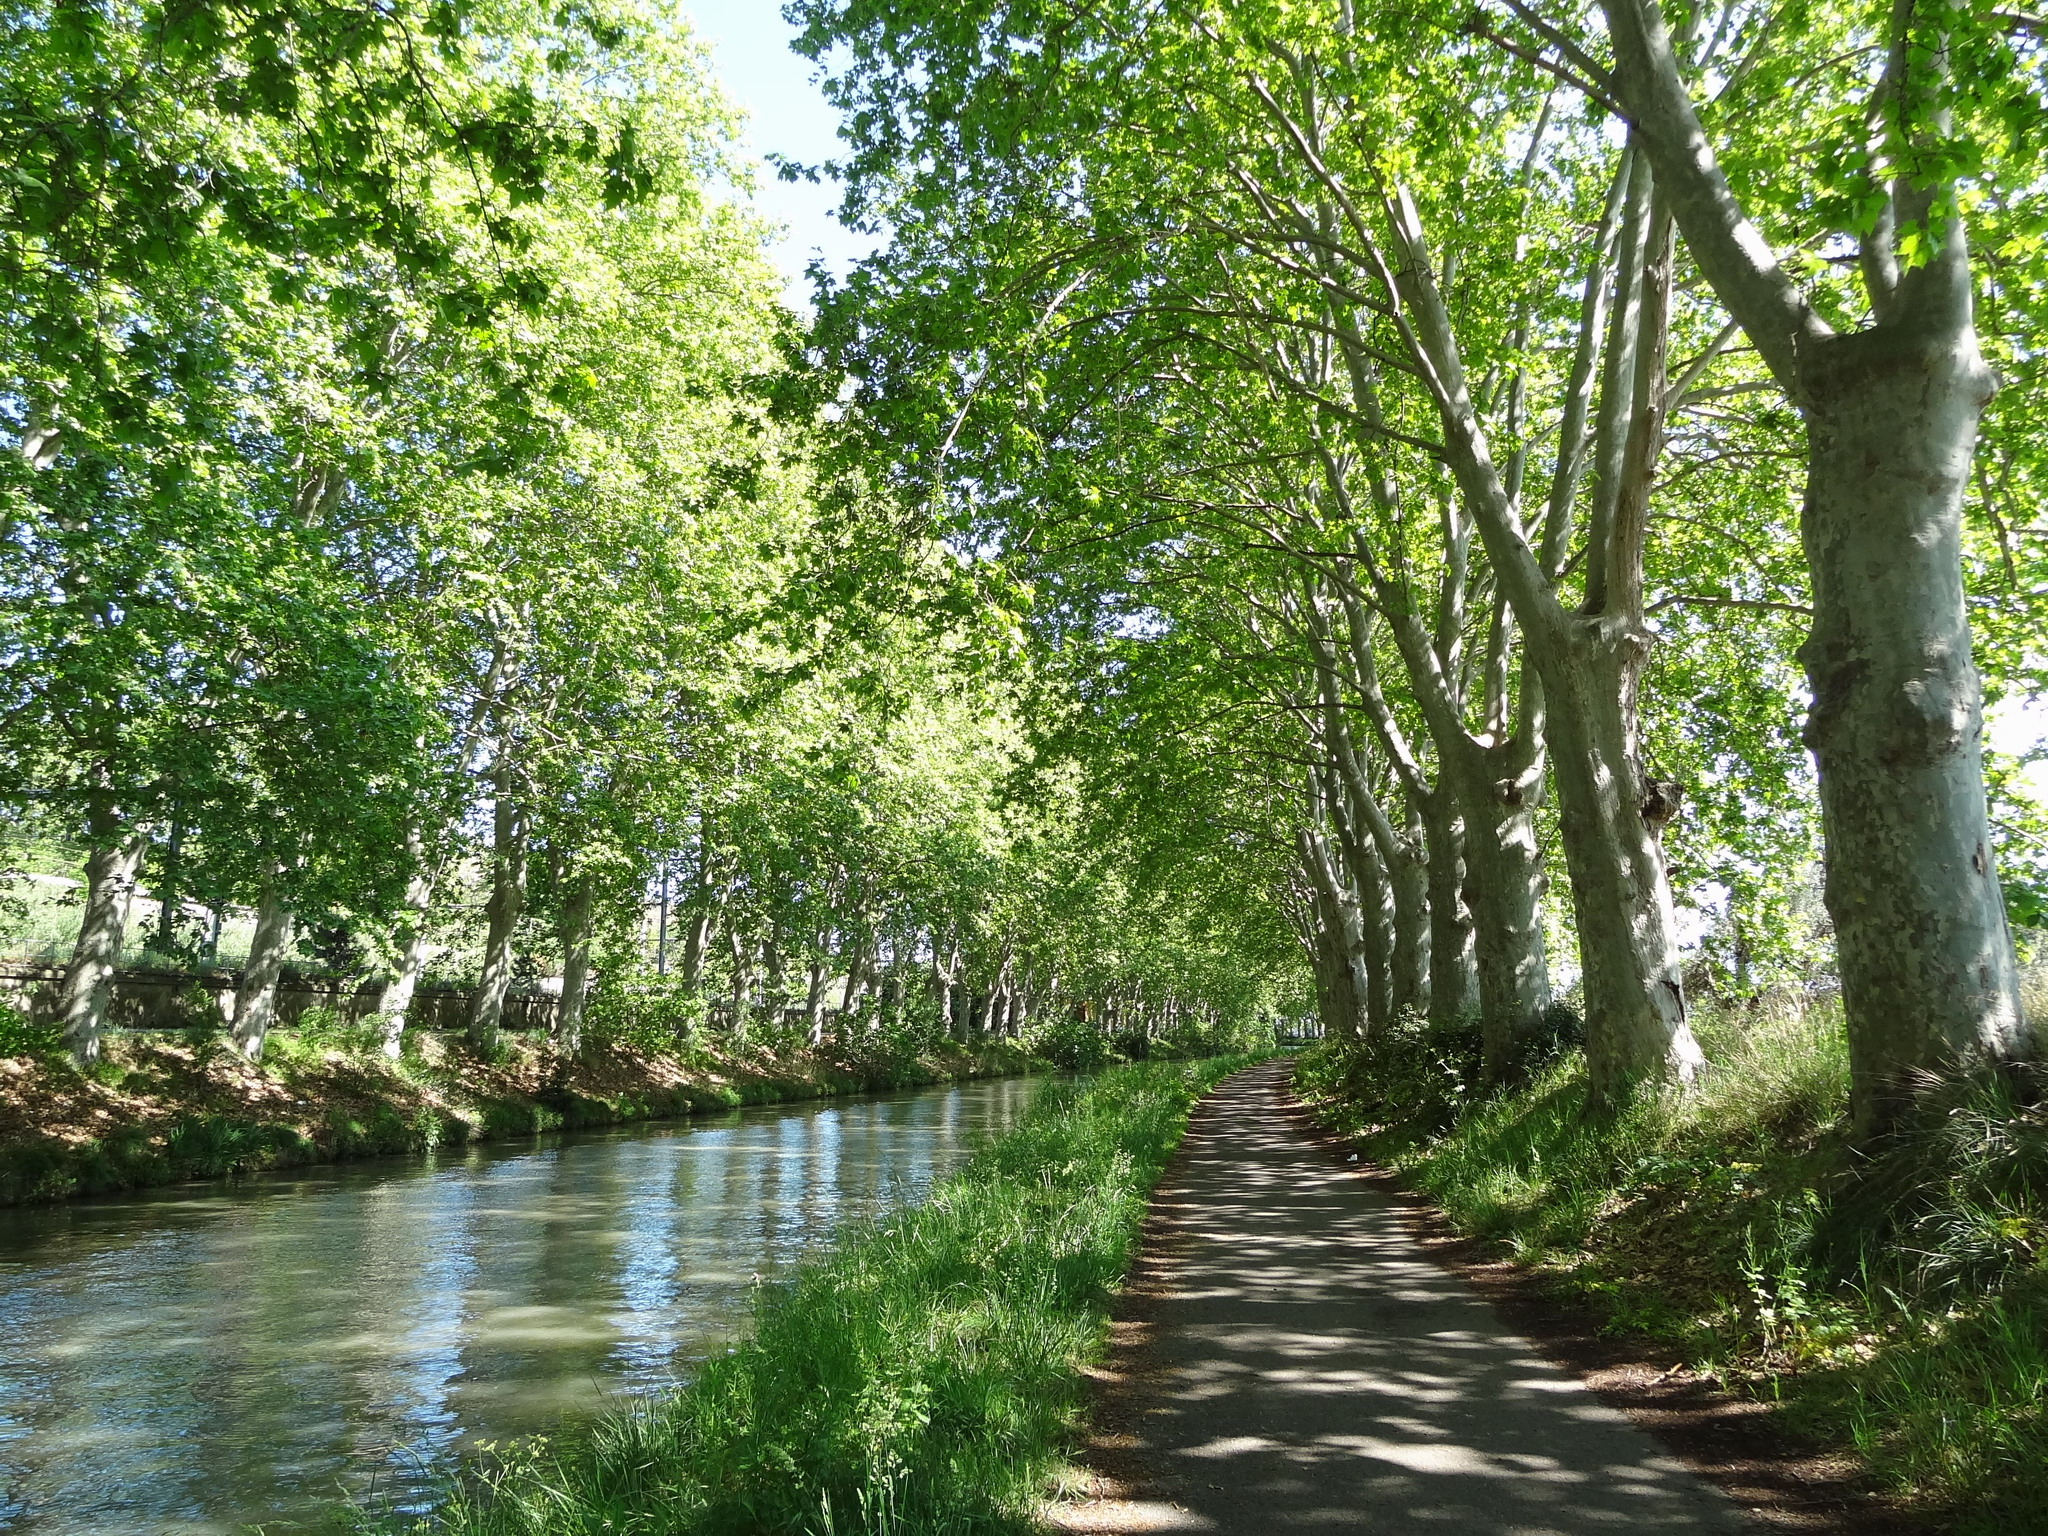 Vers la Méditerranée à vélo